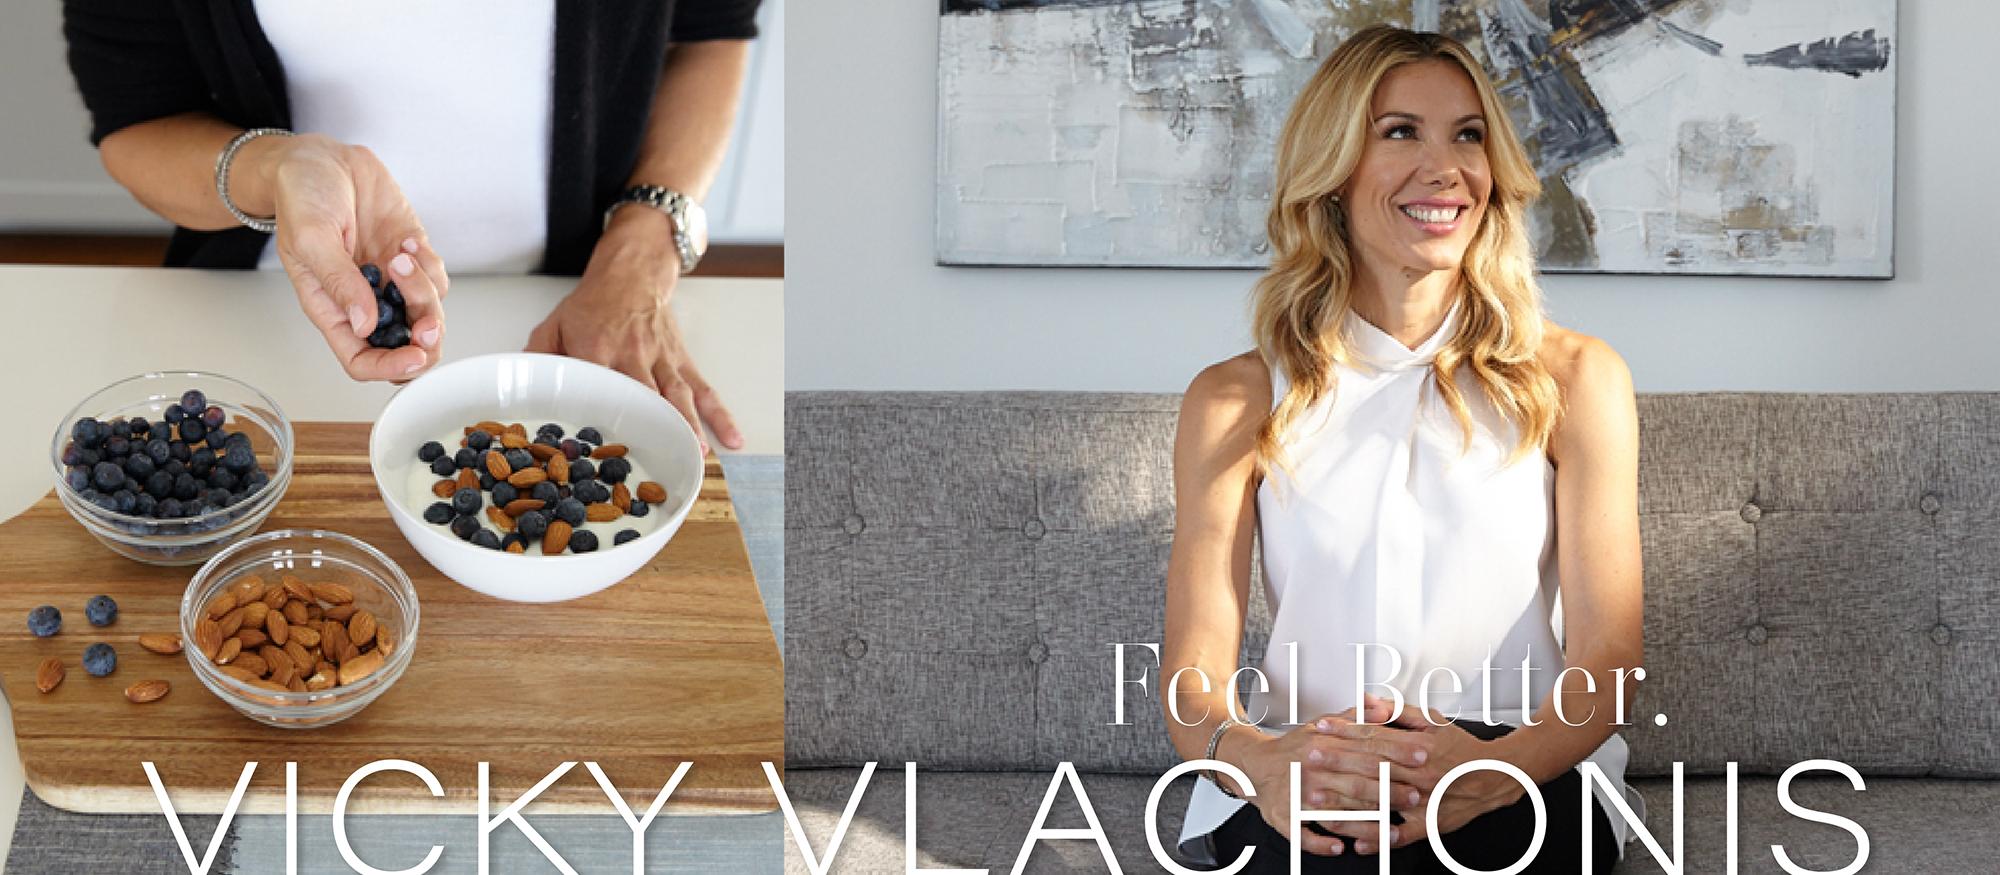 Vicky Vlachonis: Feel Better